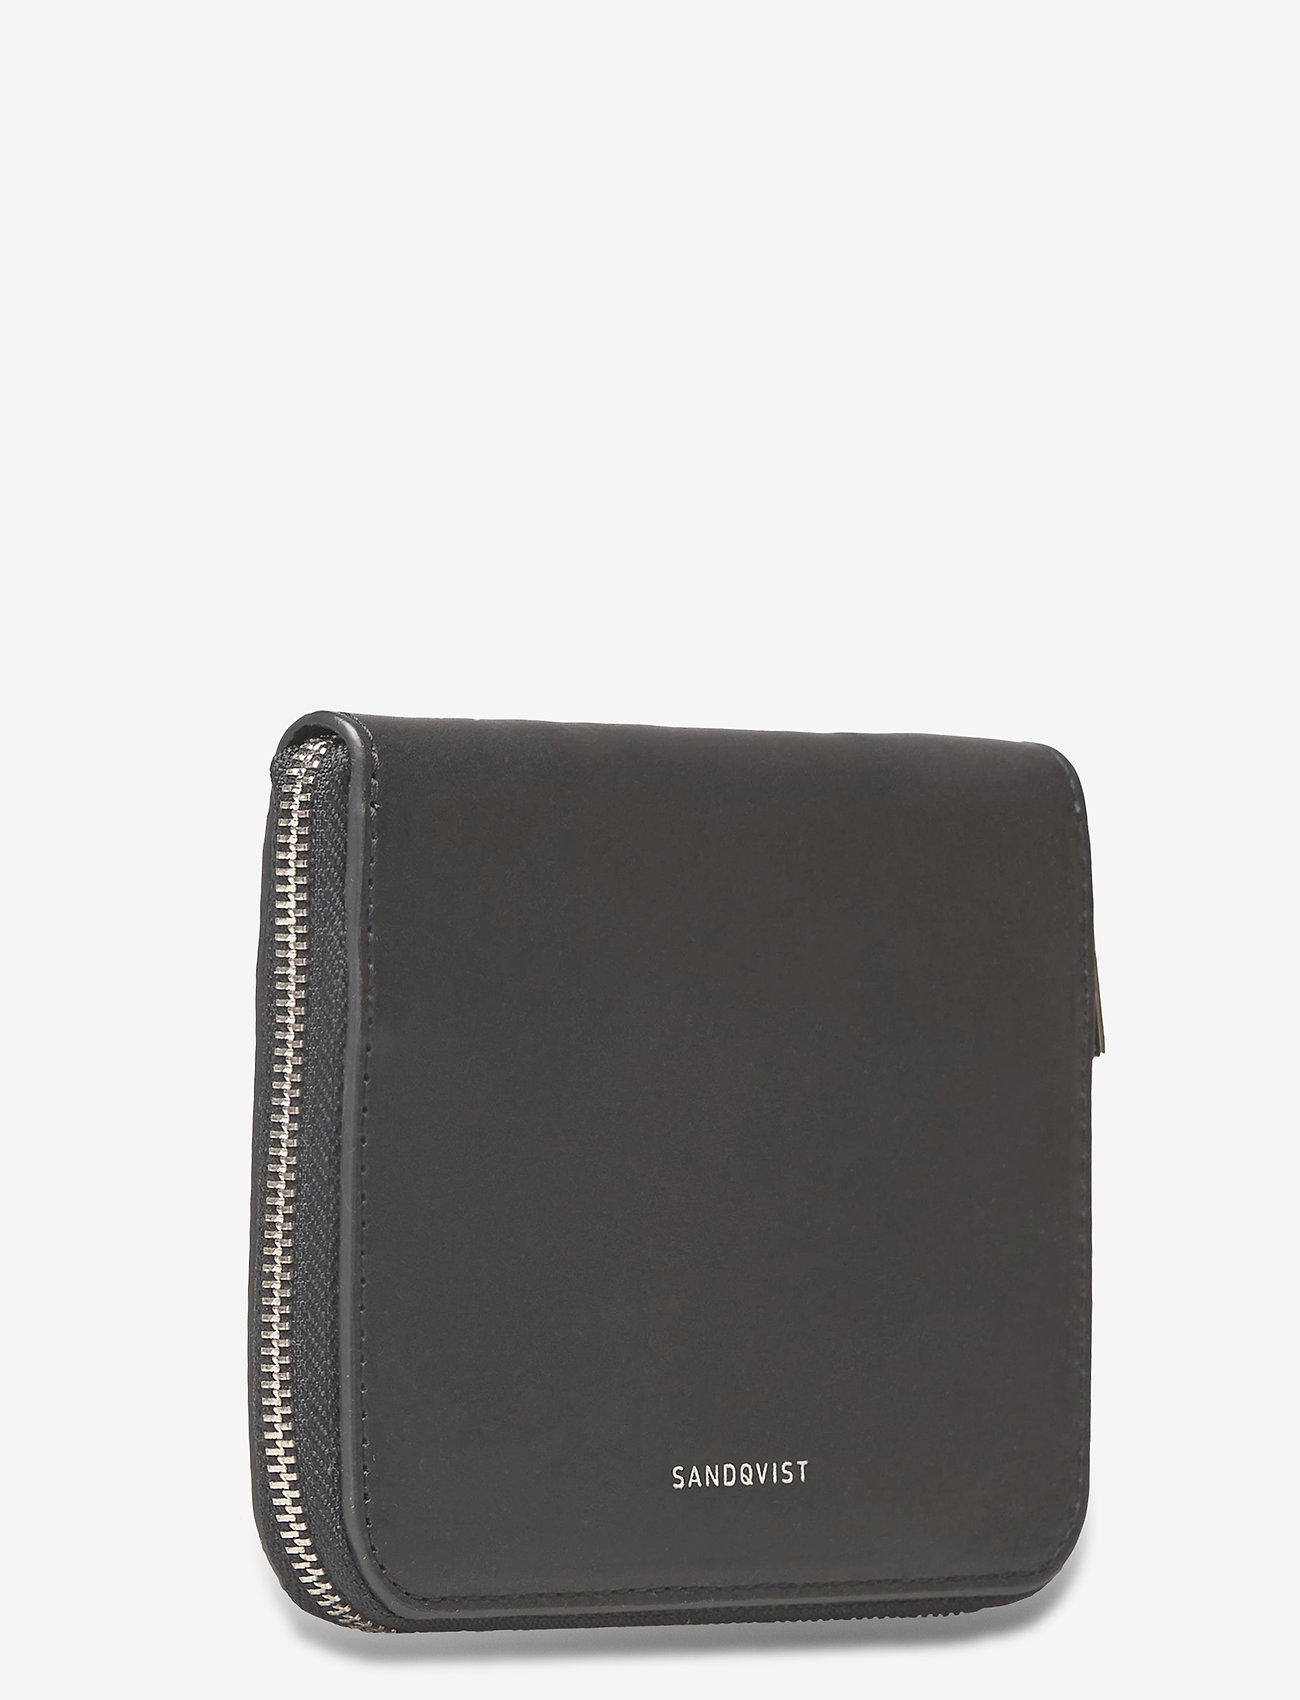 SANDQVIST - AMANDA - purses - navy with black interior - 2